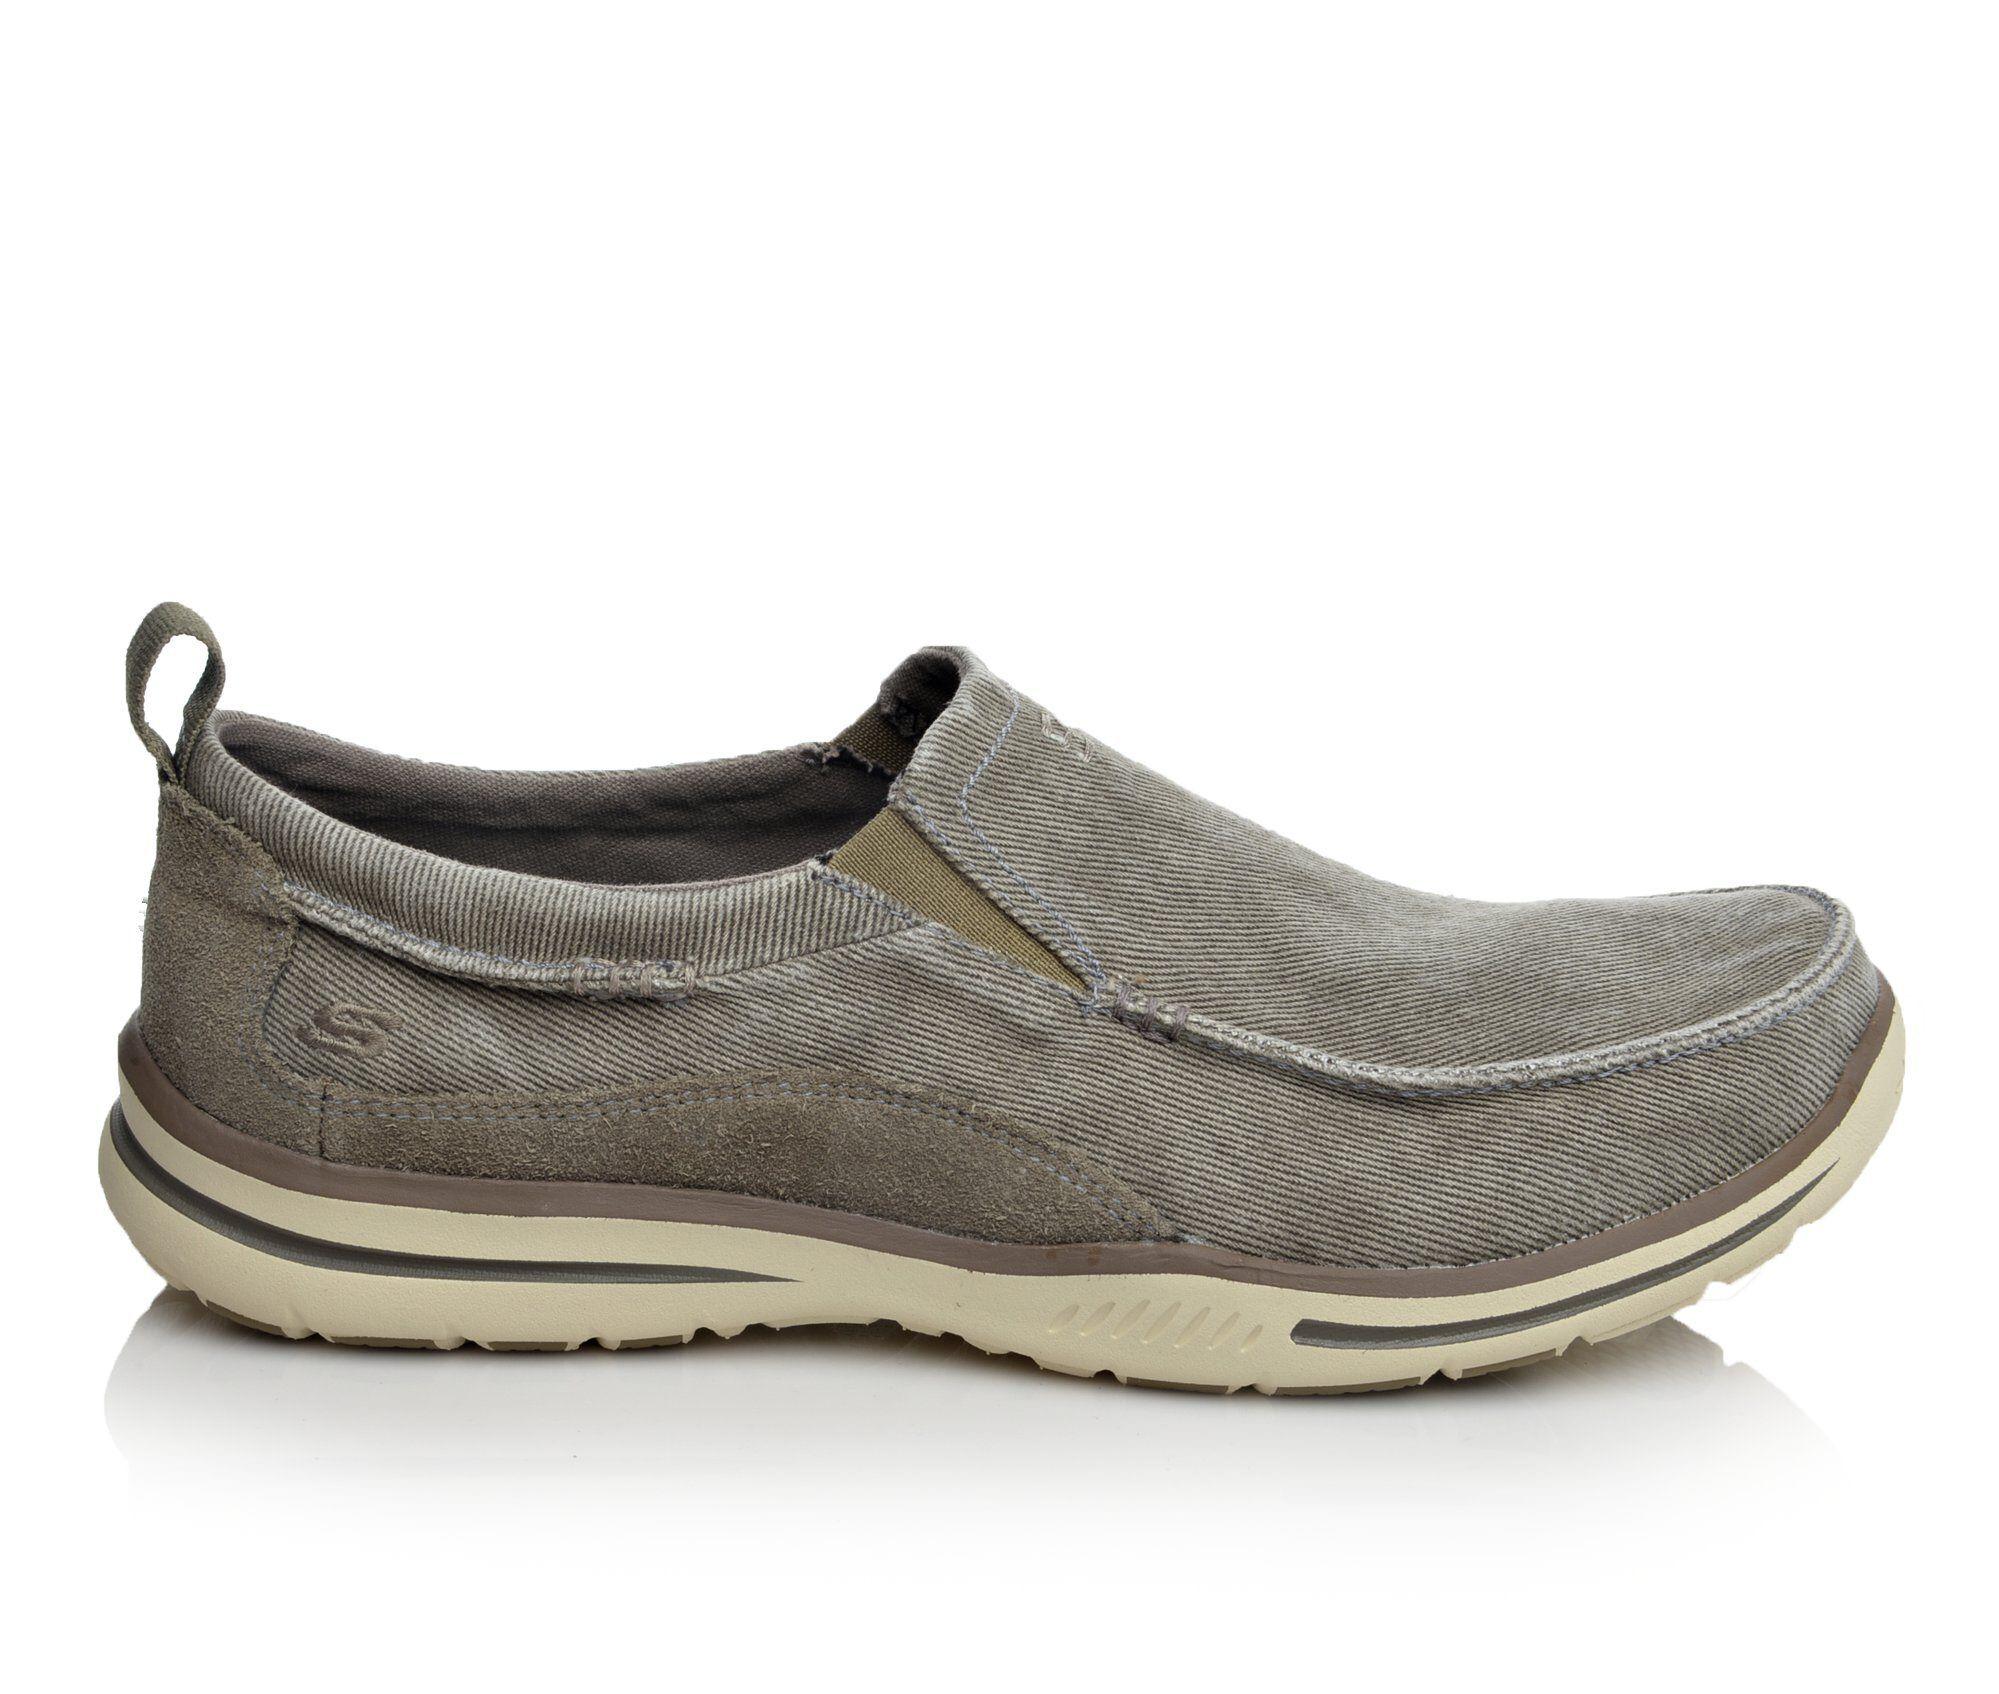 Men's Skechers Drigo 64654 Casual Shoes Taupe